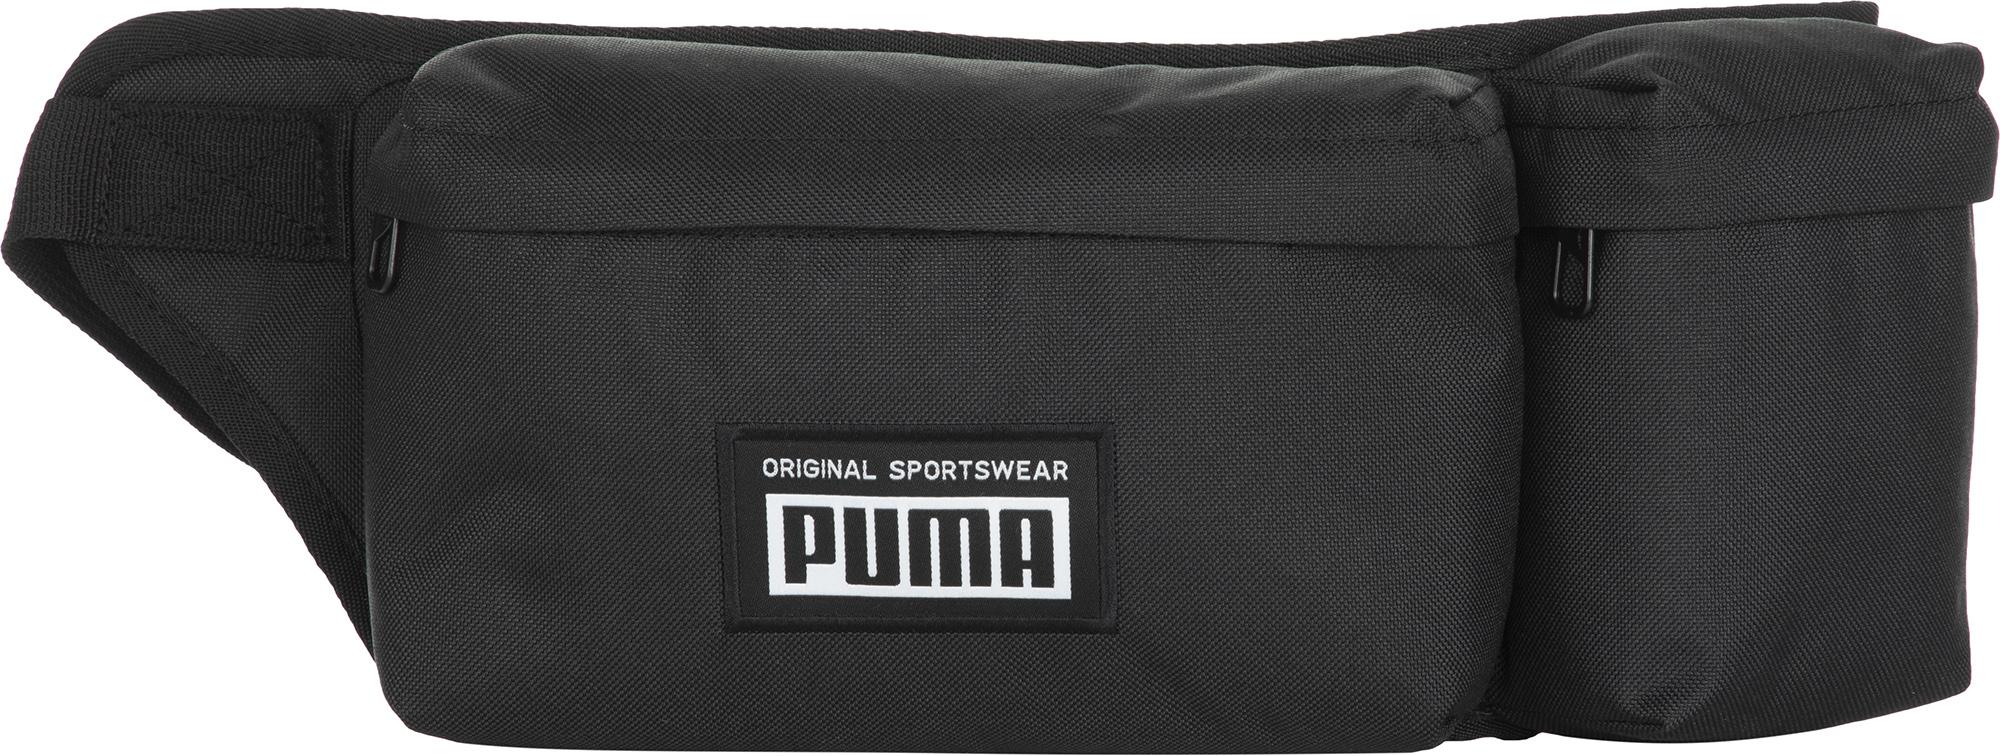 Puma Сумка на пояс Puma Academy puma сумка puma challenger размер null